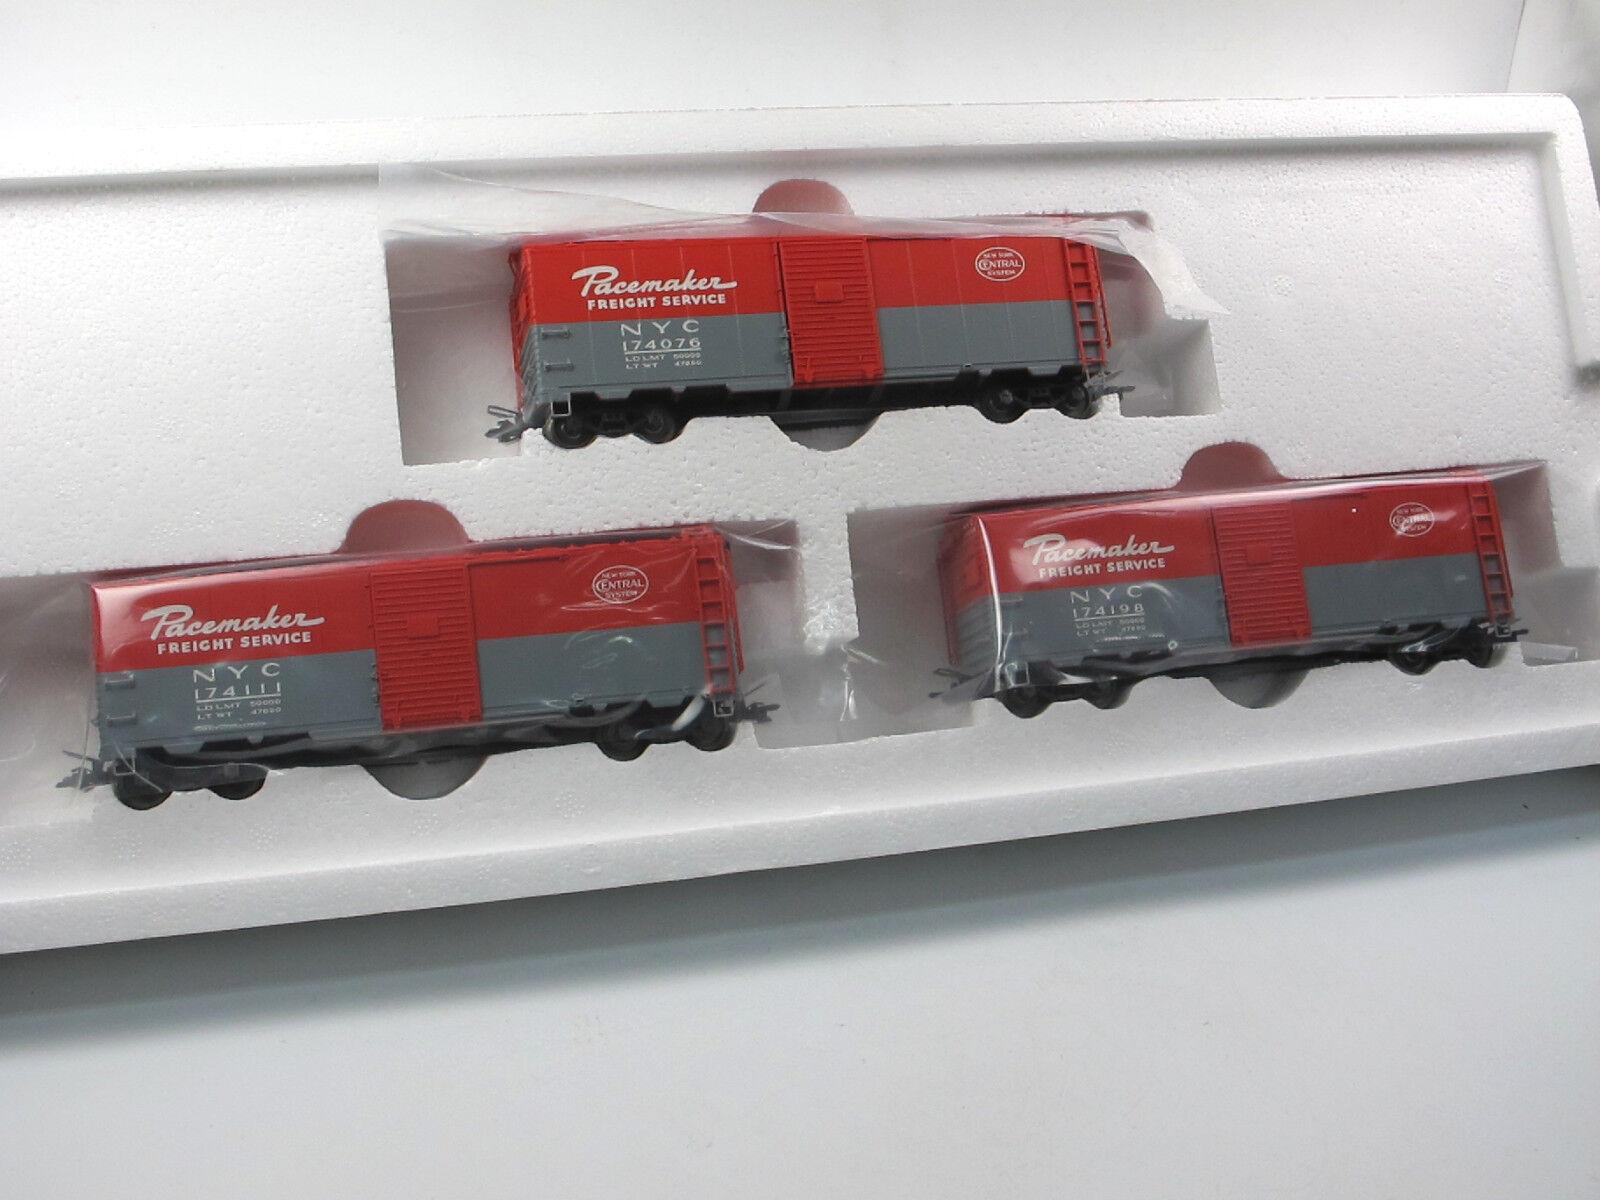 Märklin 45648 Freight Car Set 3 garantite carri merci NYC pacemaker h0 NUOVO OVP